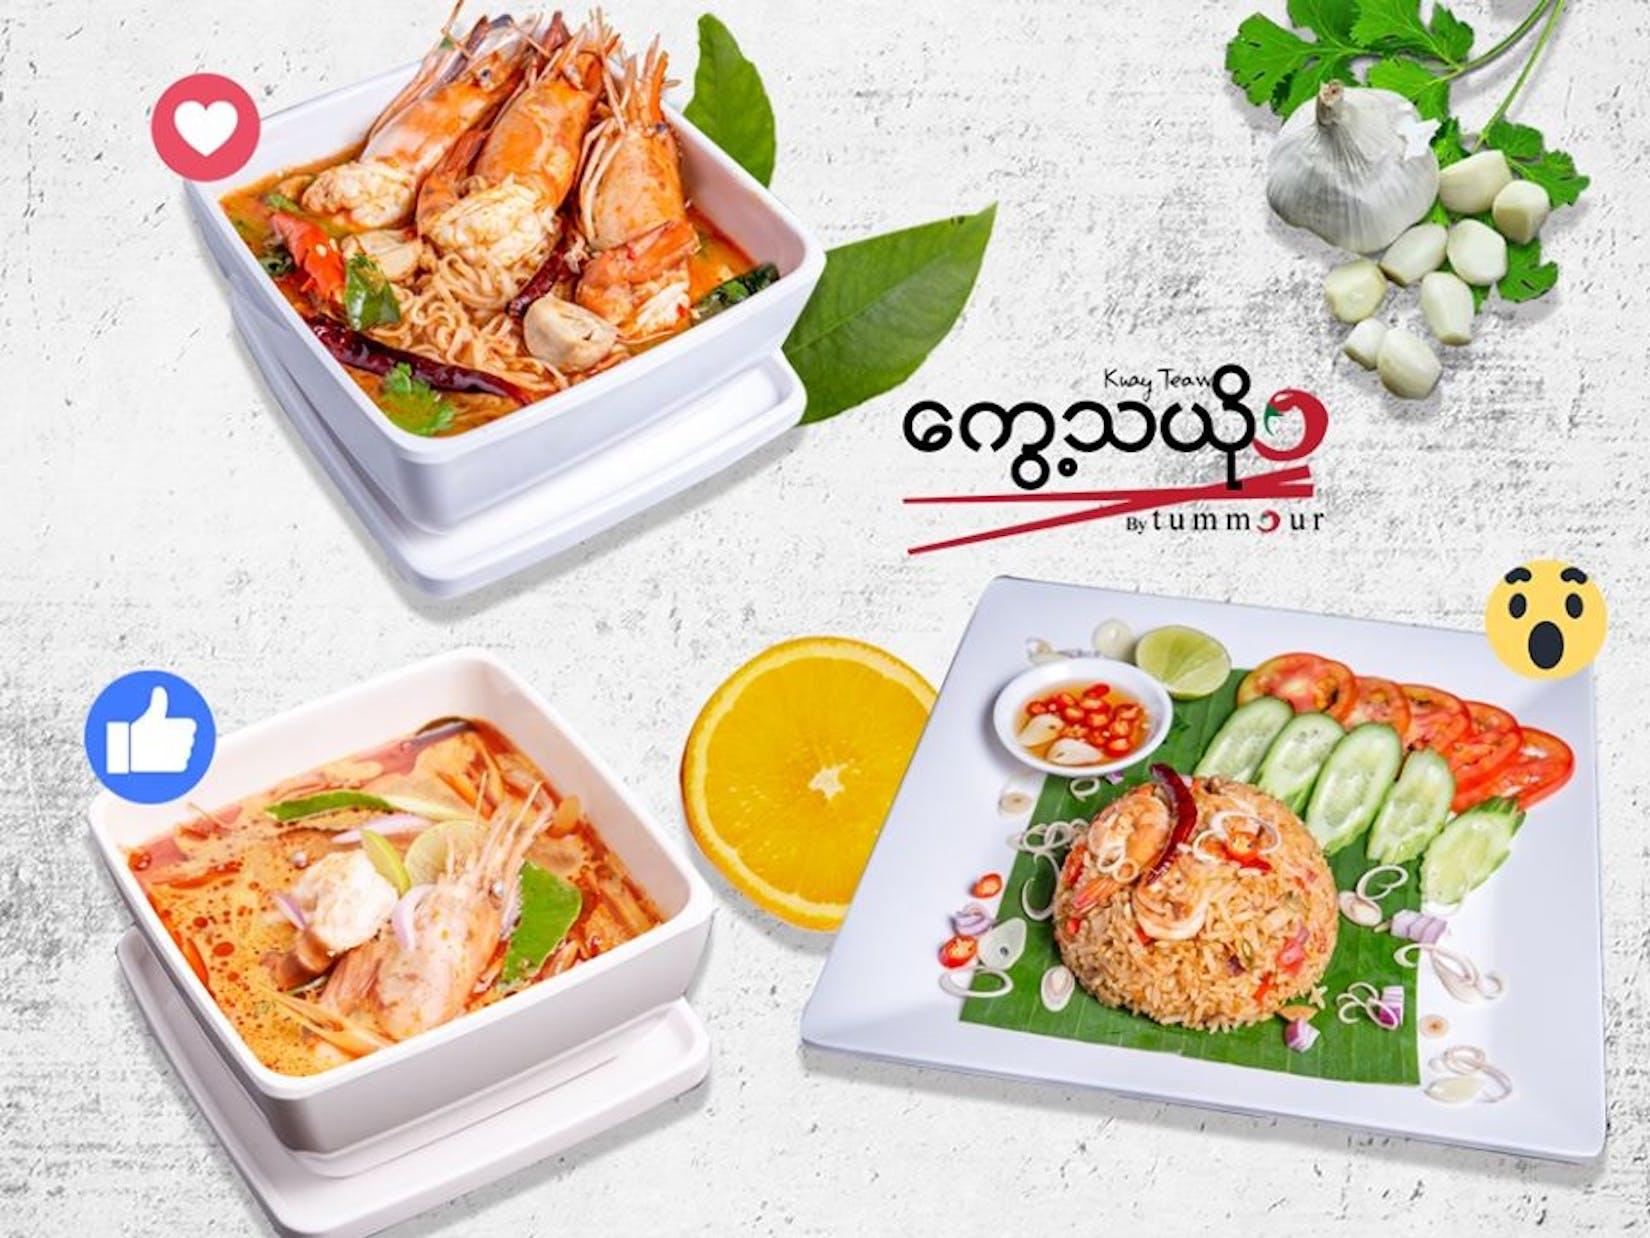 Tummour Myanmar | yathar